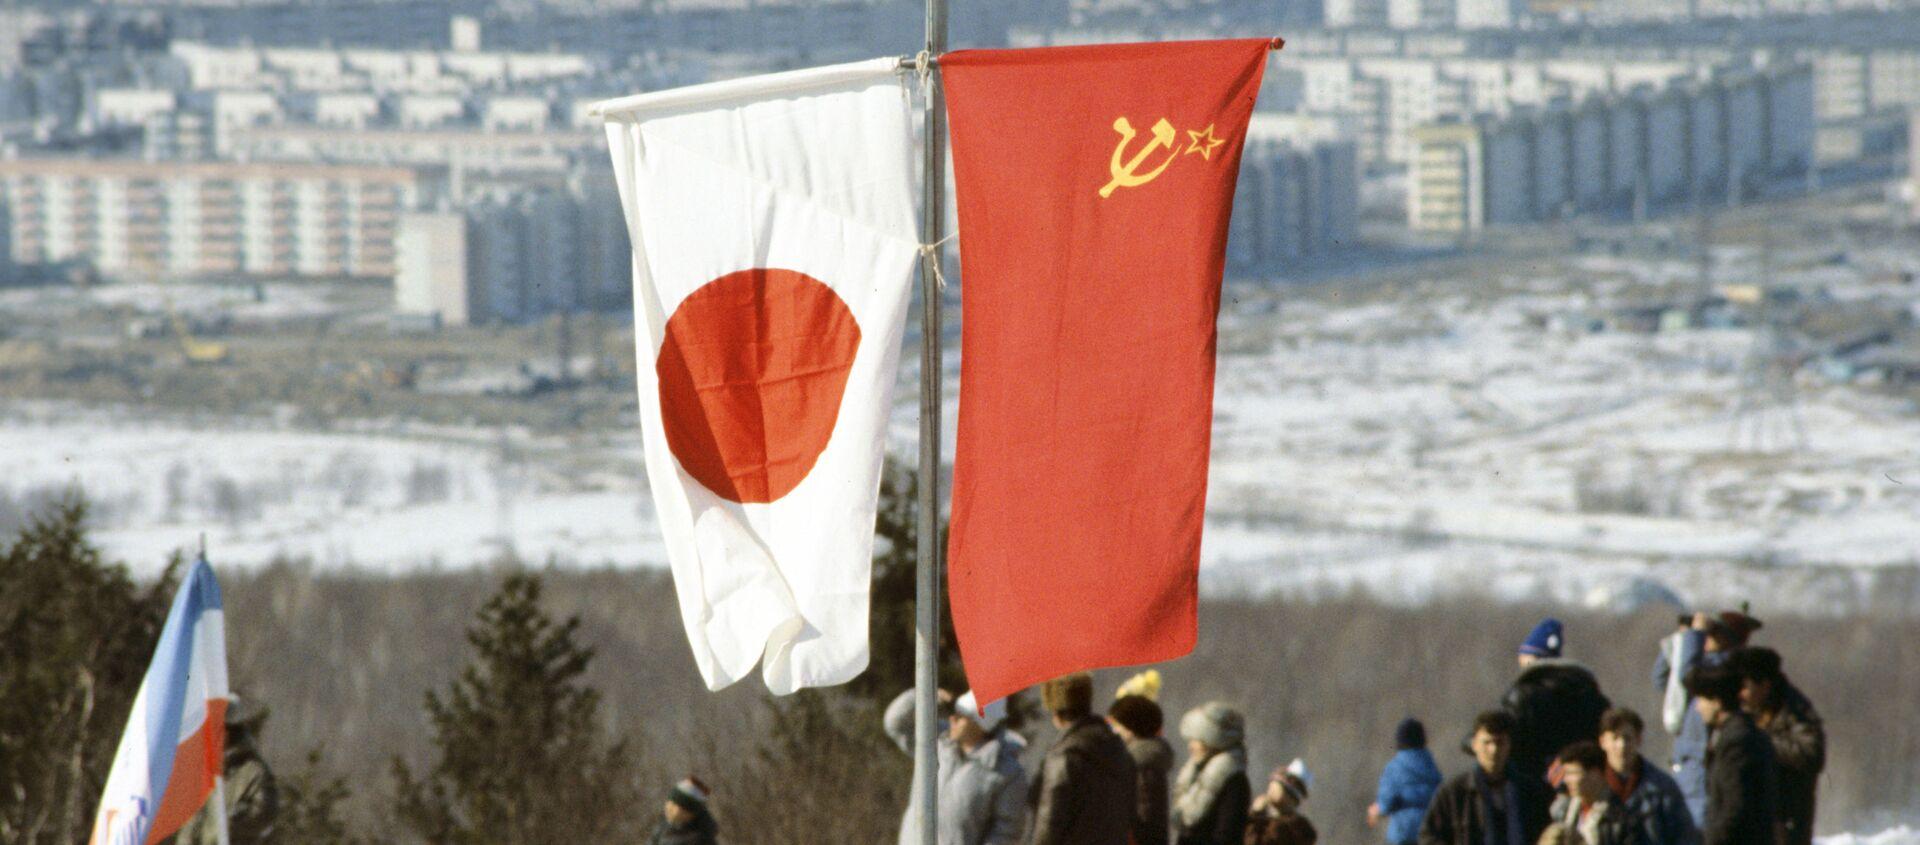 Quốc kỳ - Sputnik Việt Nam, 1920, 11.04.2021